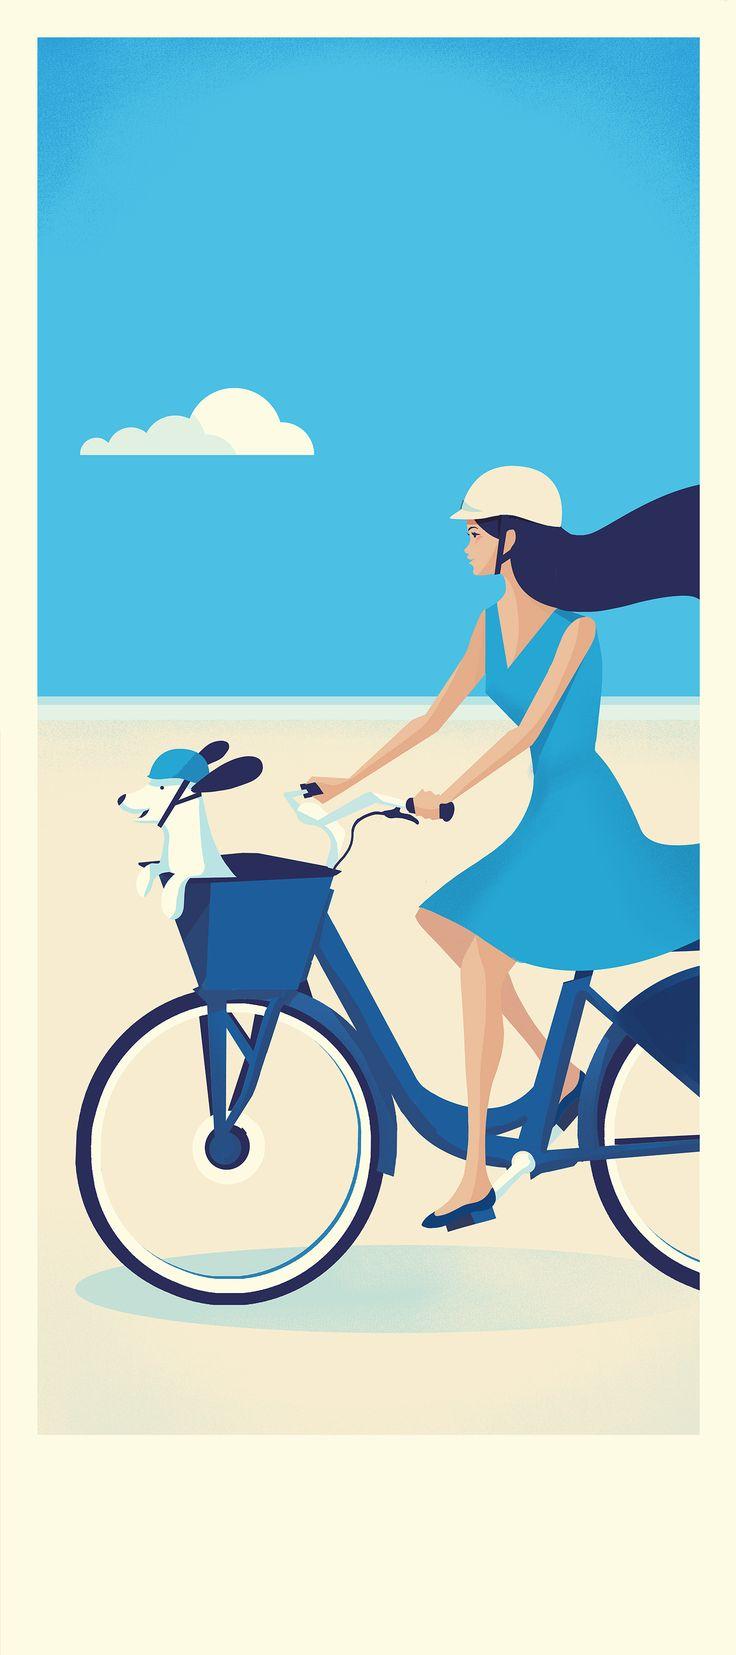 Citi Bike Miami by Pietari Posti | Agent Pekka